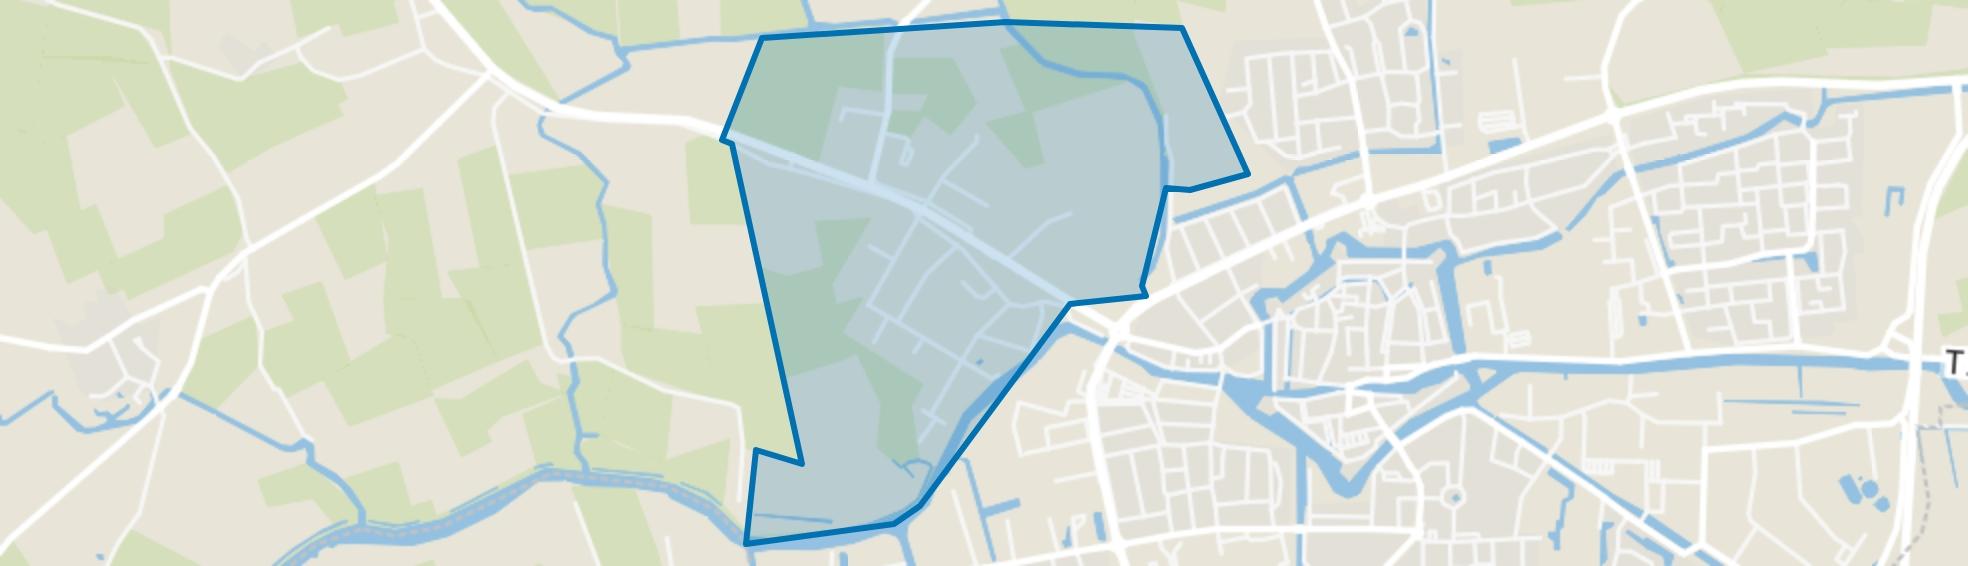 Dokkum Betterwird, Dokkum map